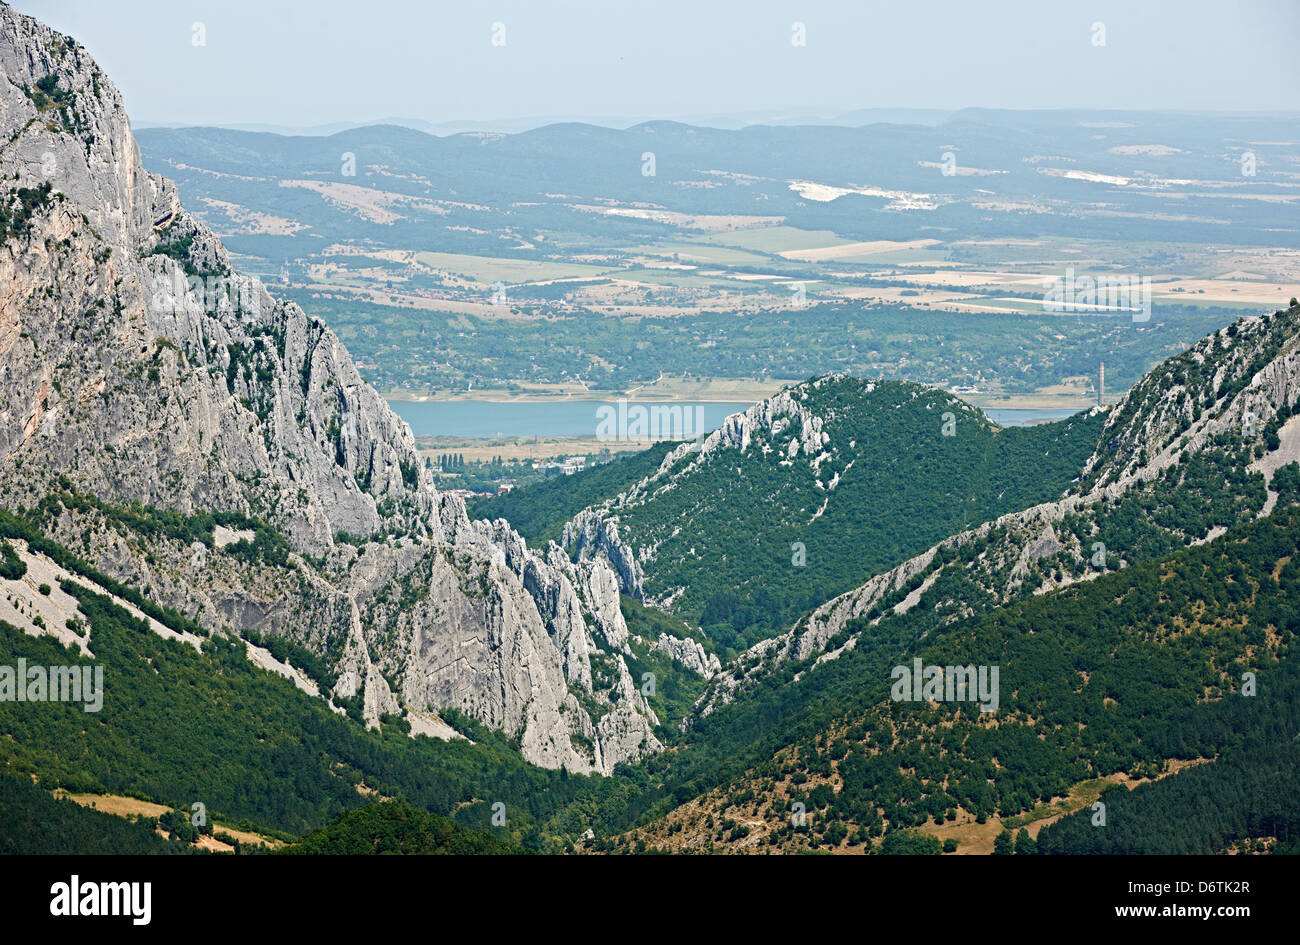 Die Vratsata Felsphänomen in der Nähe der Stadt Vratsa, Nord Bulgarien Sommerlandschaft Stockbild